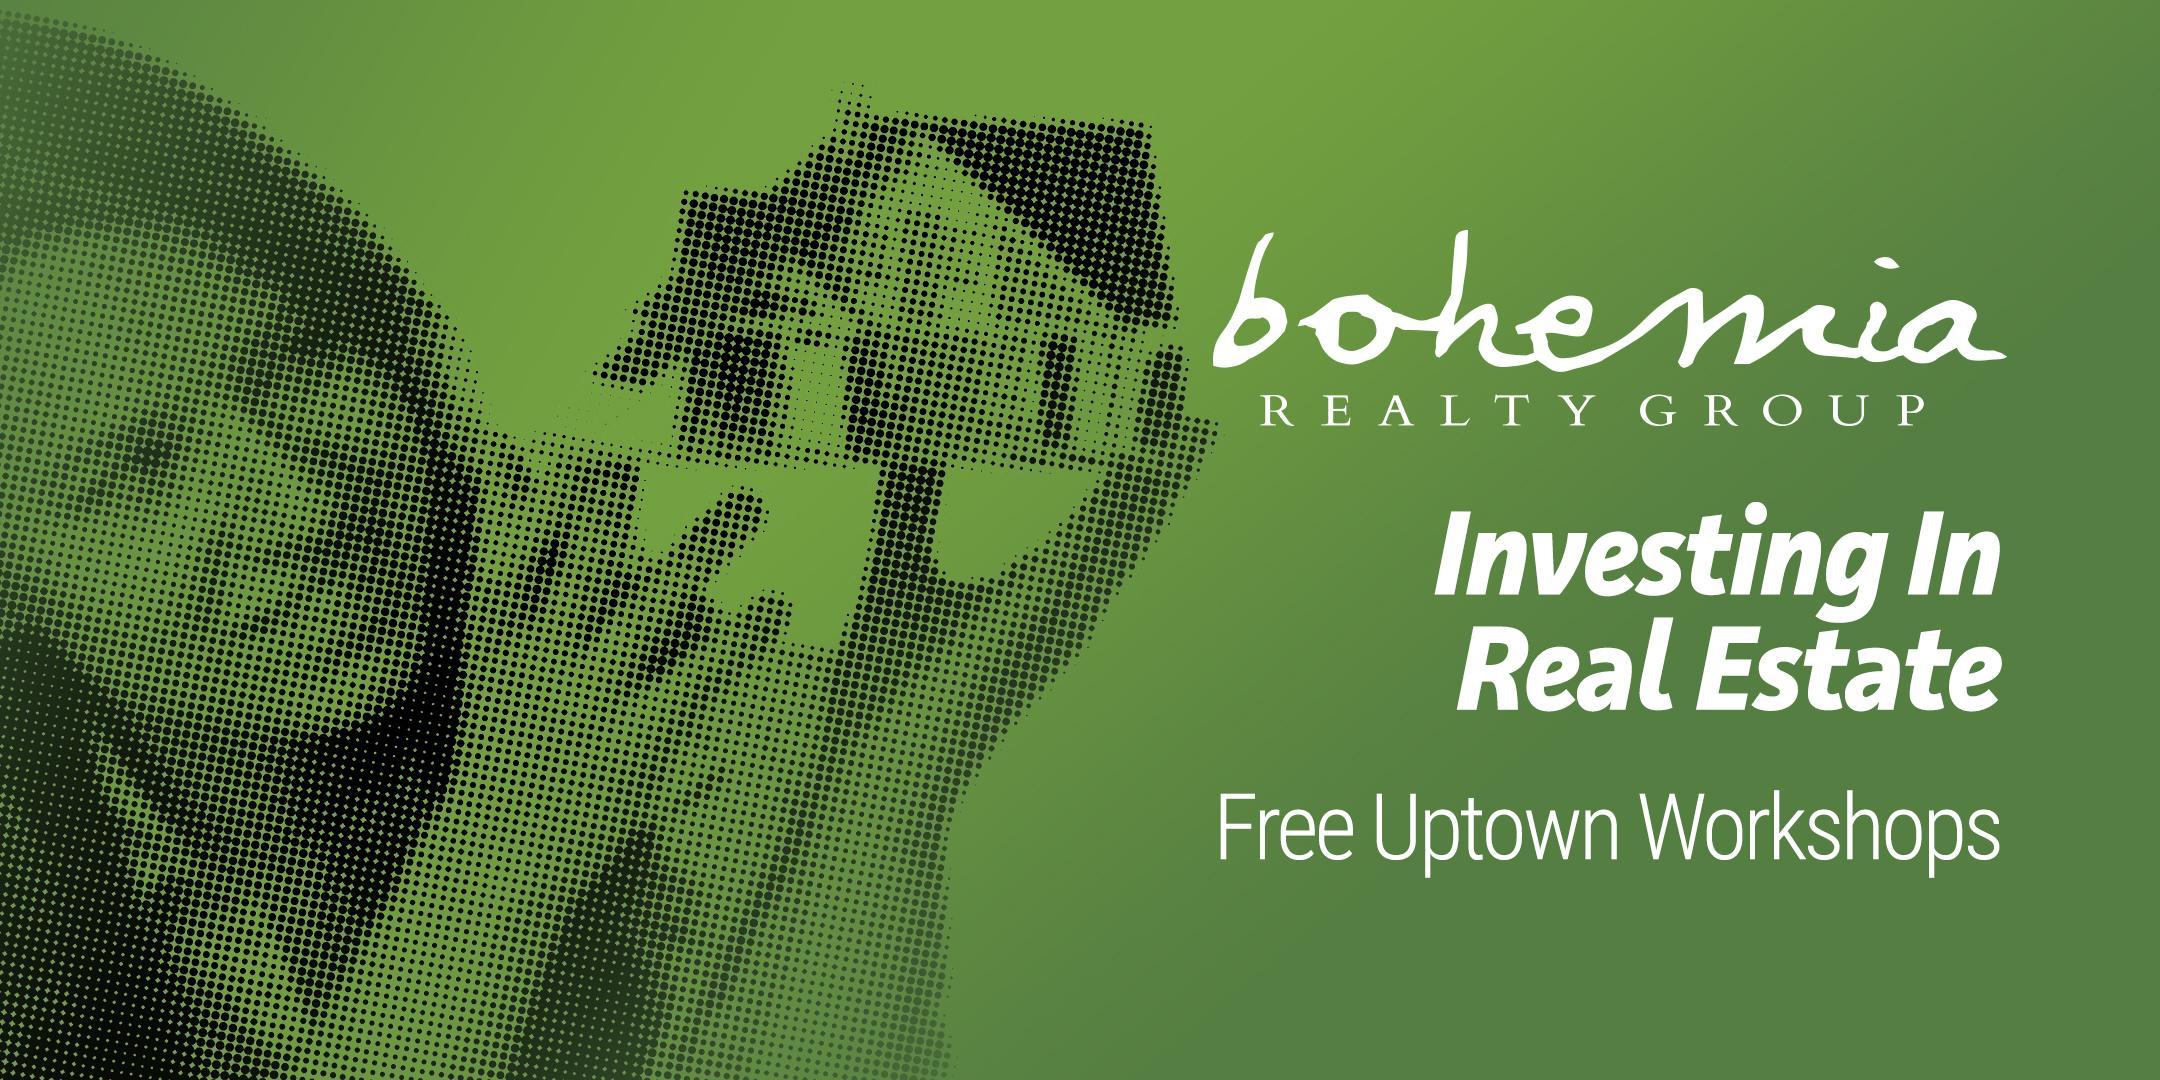 Investing in Real Estate Community Workshop